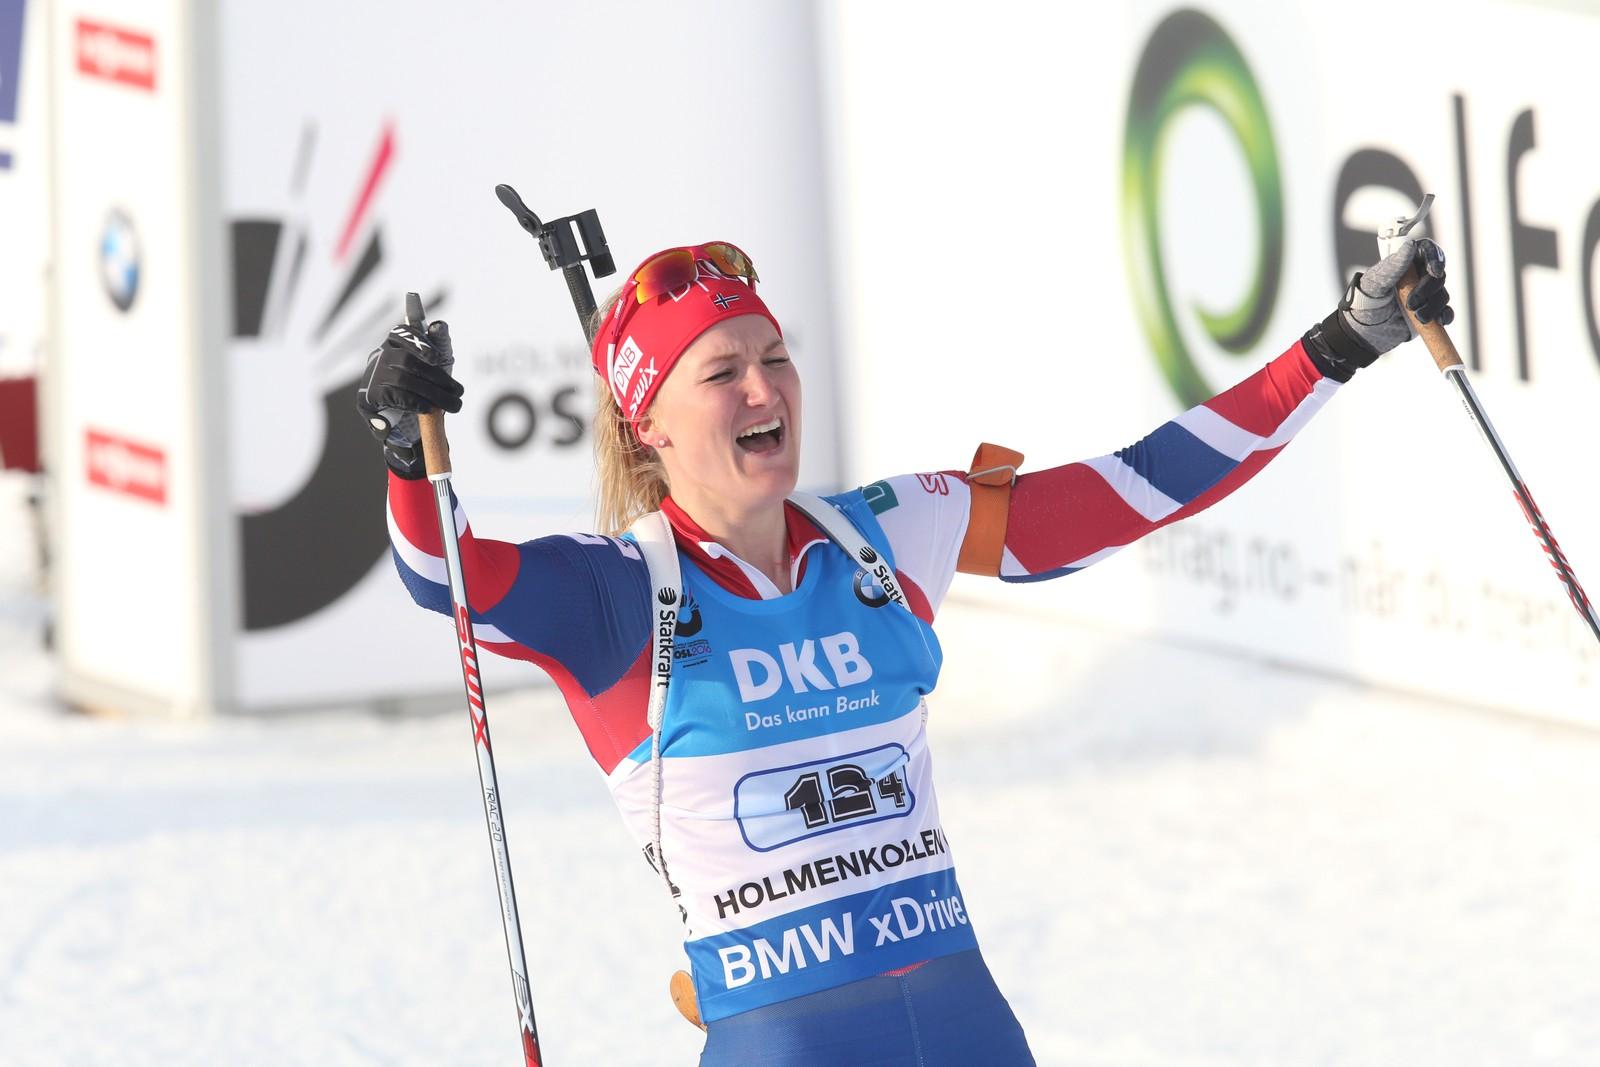 Skiskytter-VM i Oslo 2016. Marte Olsbu under stafett kvinner i VM i skiskyting i Holmenkollen fredag.